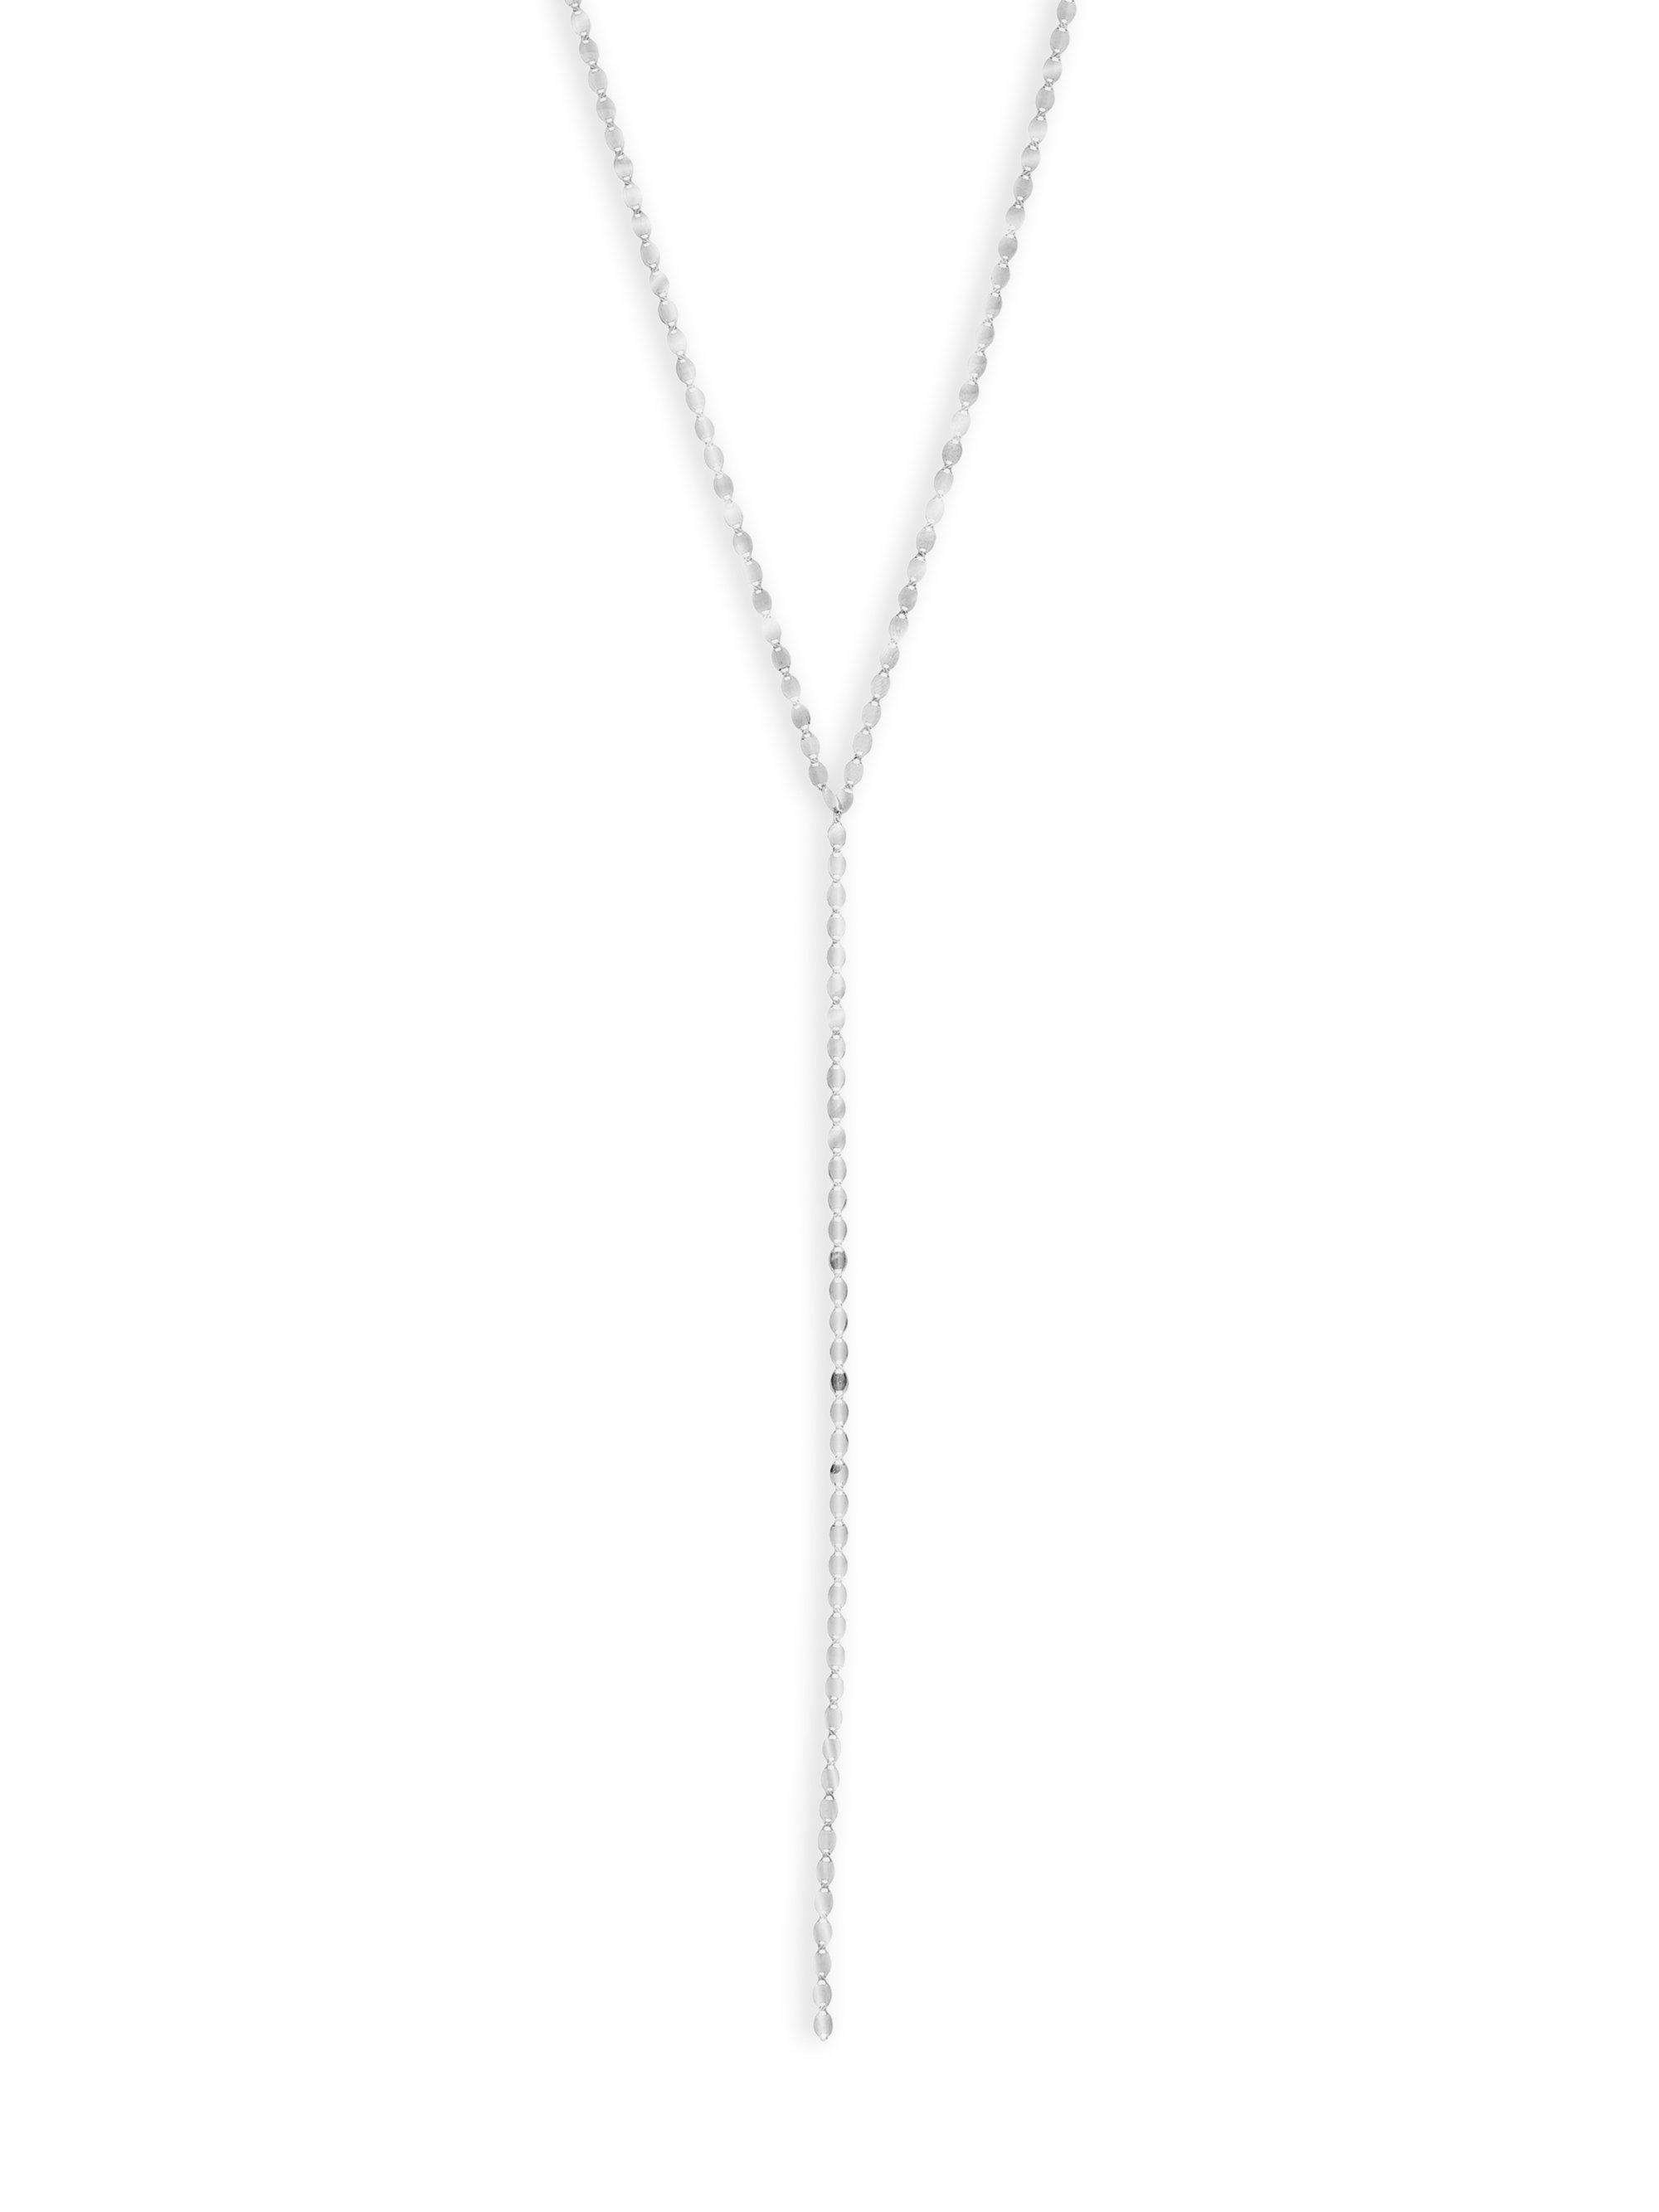 Lana Jewelry Bond Nude 14K Lariat Necklace WeWEnmqe